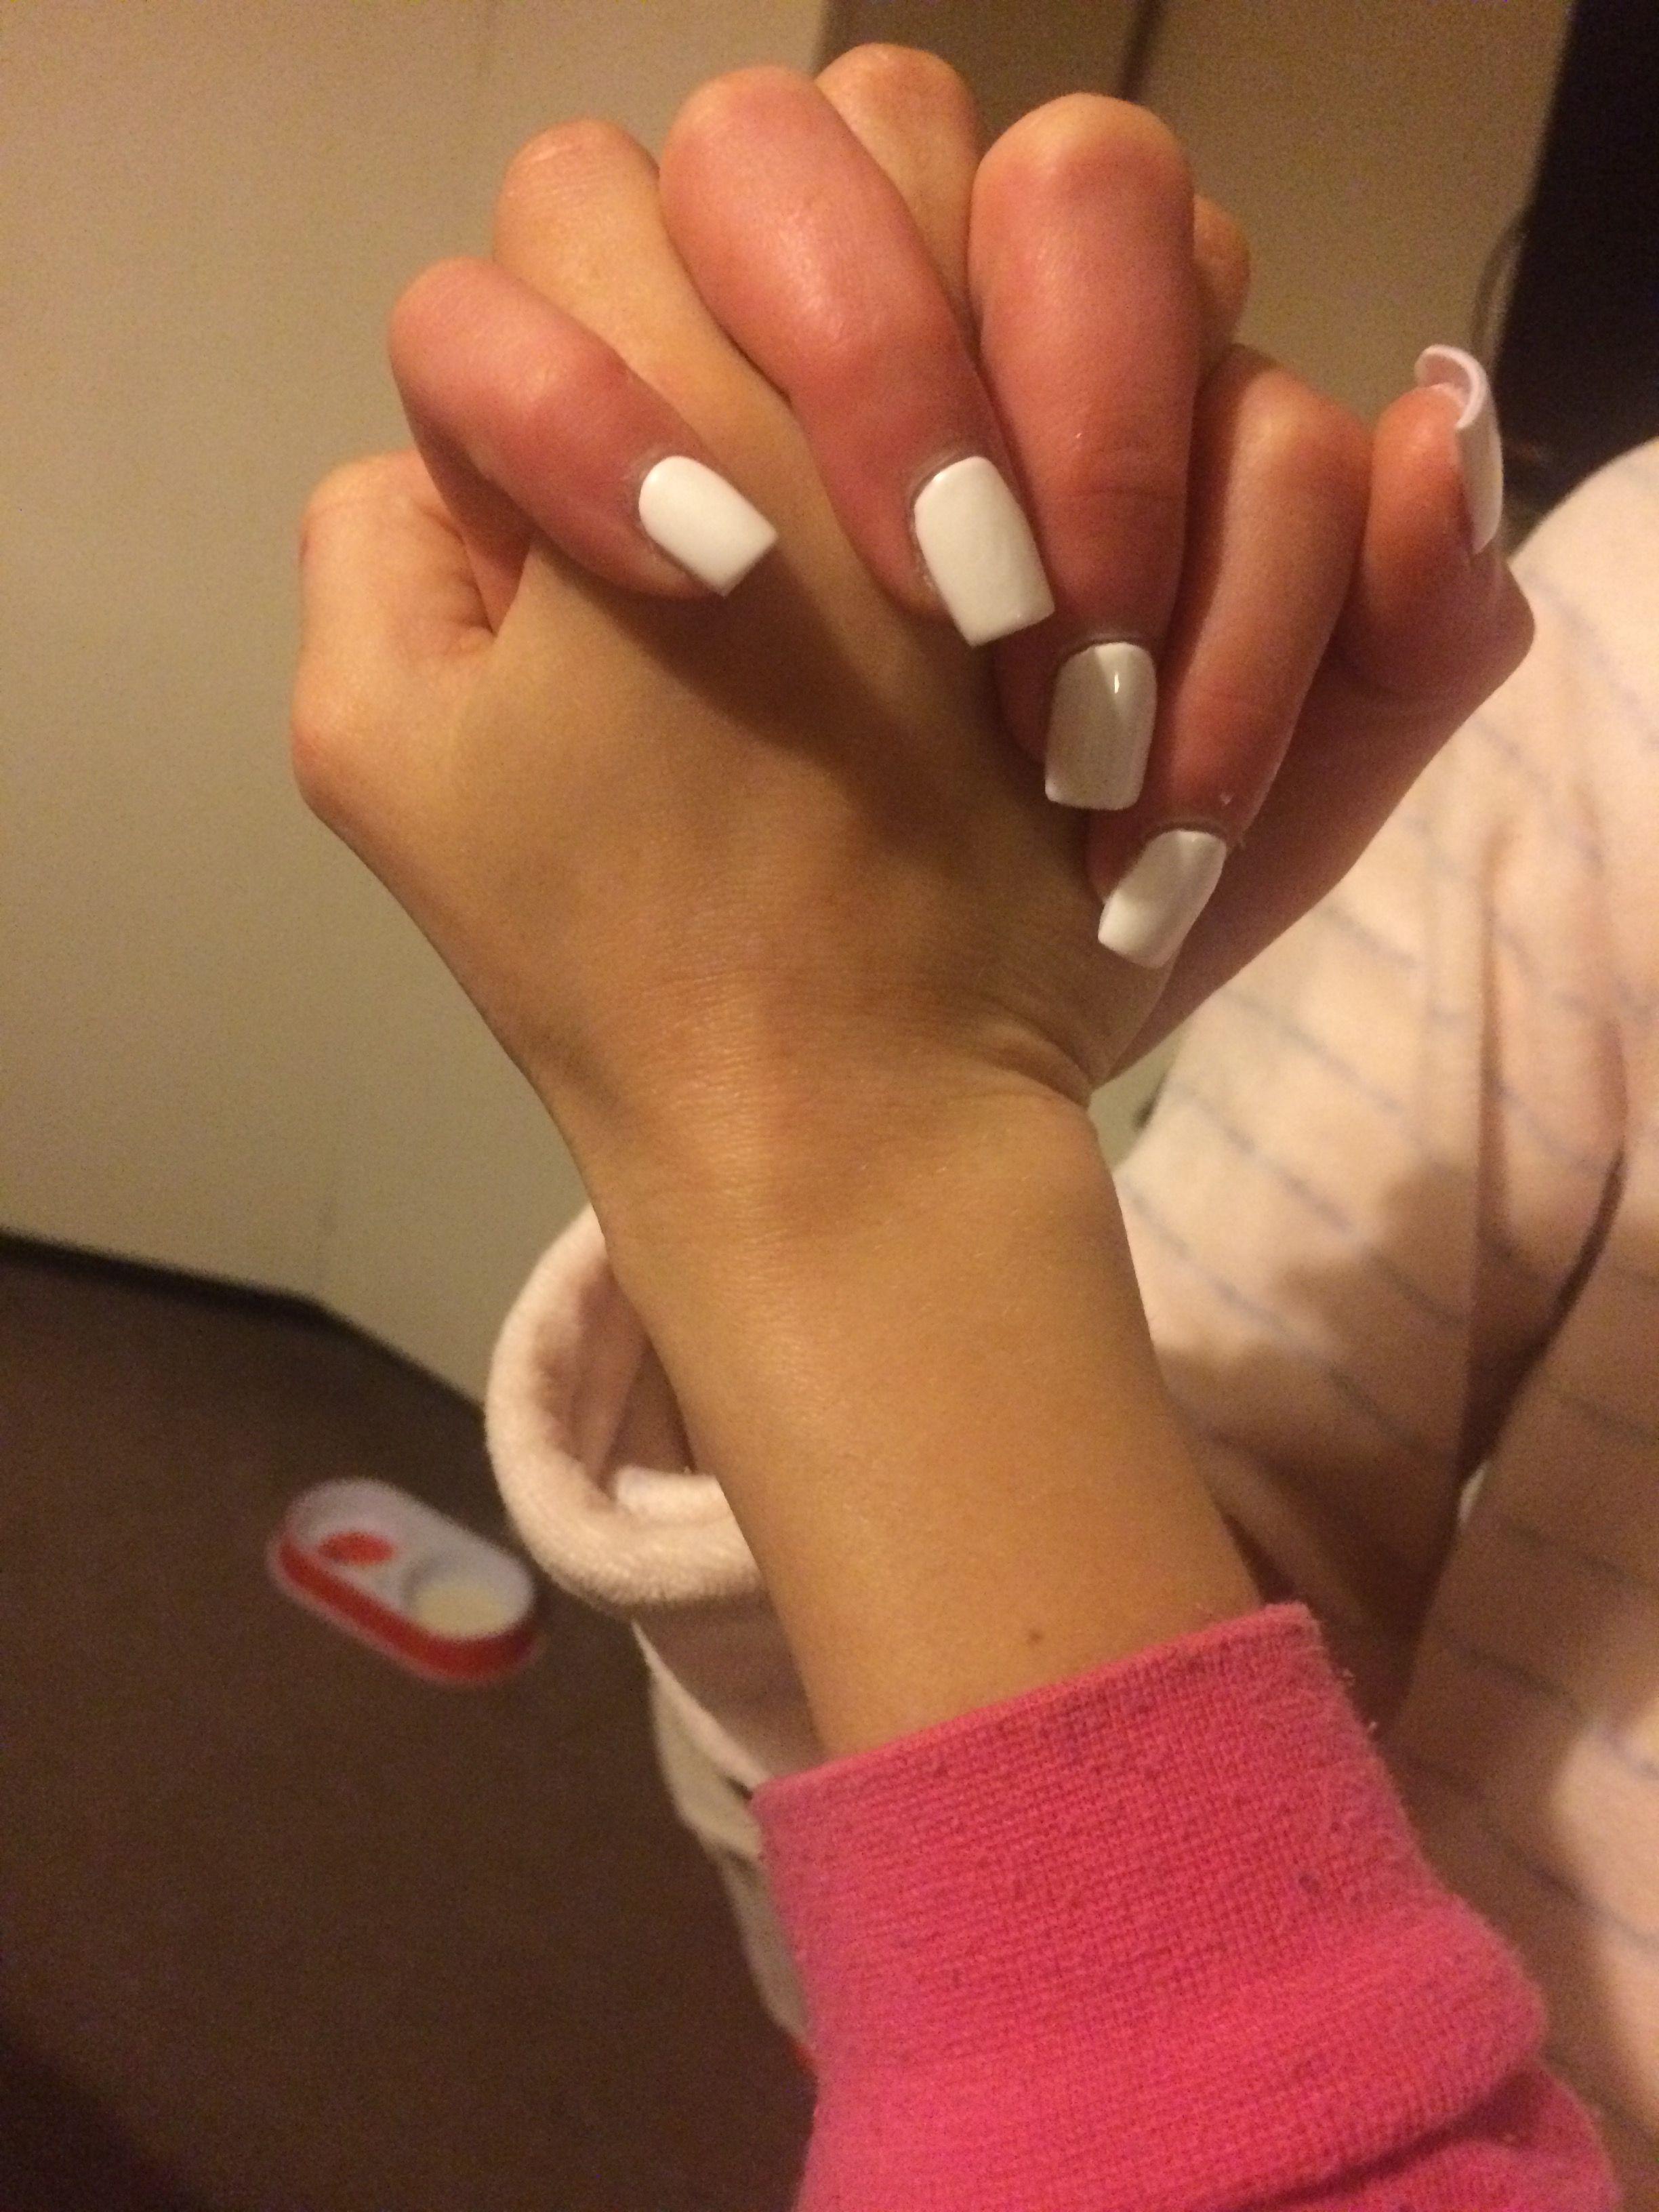 White Acrylics Holding Hands With Cuz White Acrylics Acrylic Nails